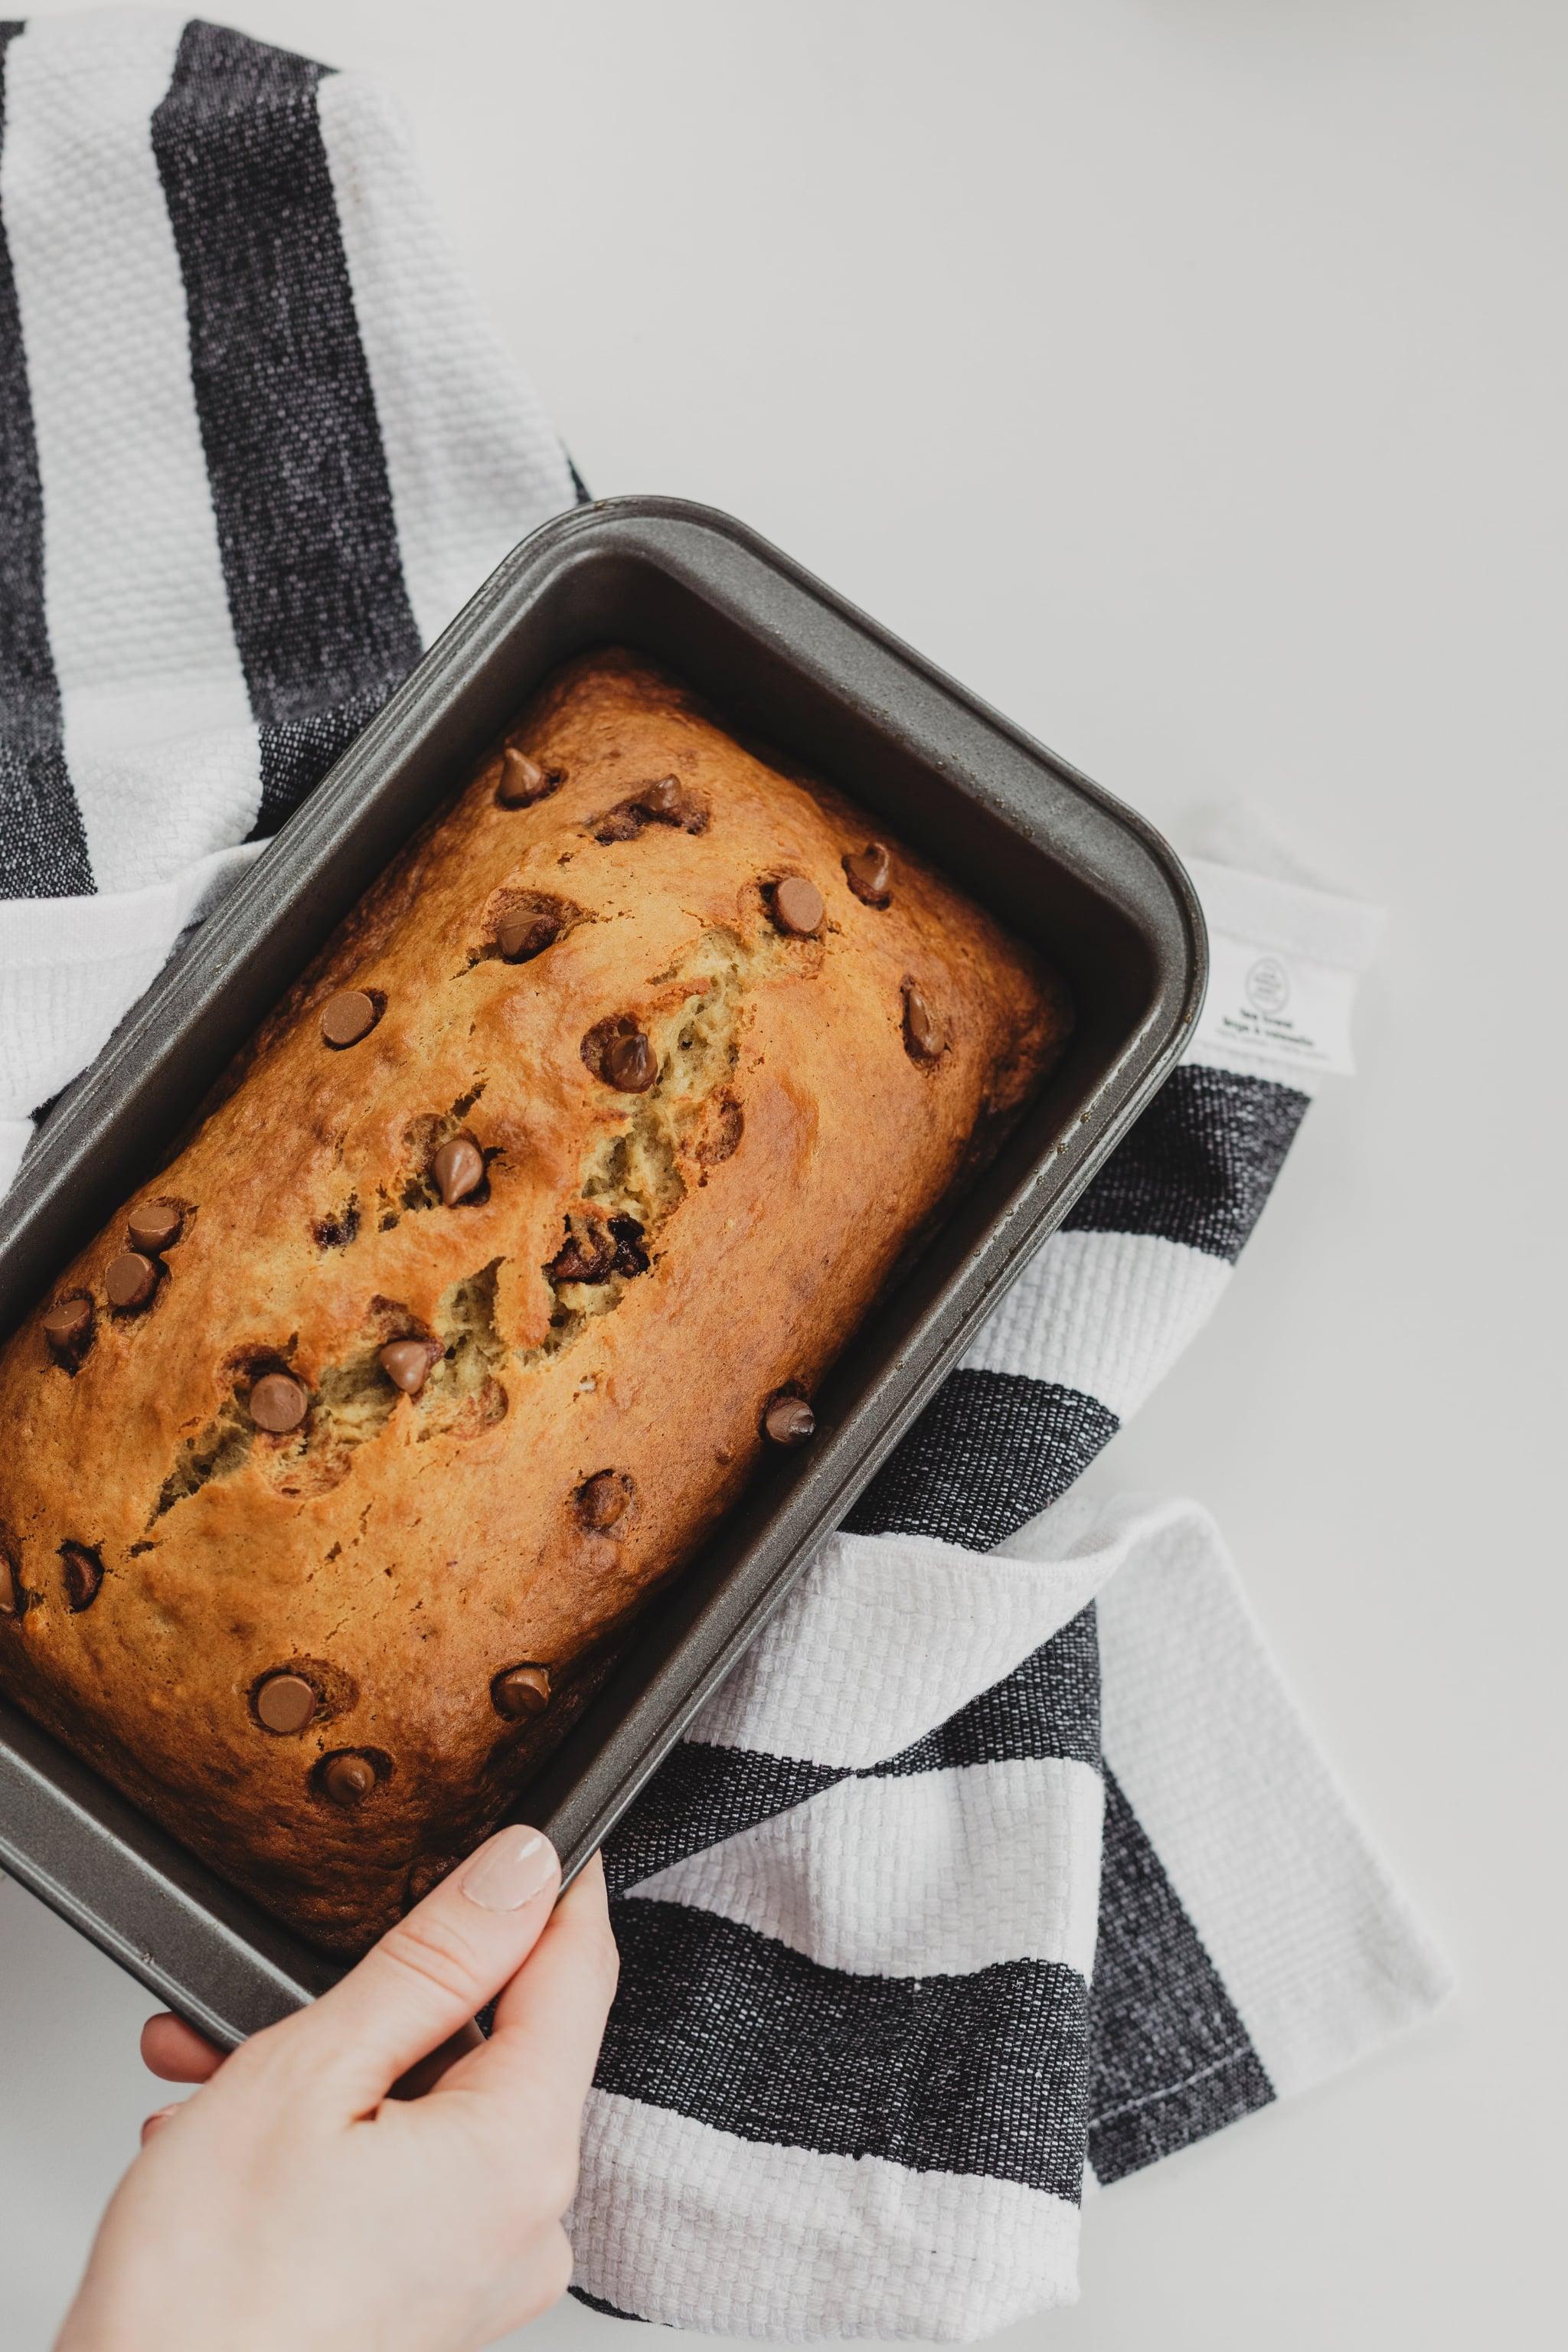 tmp_RDsAsv_0f199e63b1f27e18_this-baking-looks-so-good-you-can-almost-taste-it.jpg